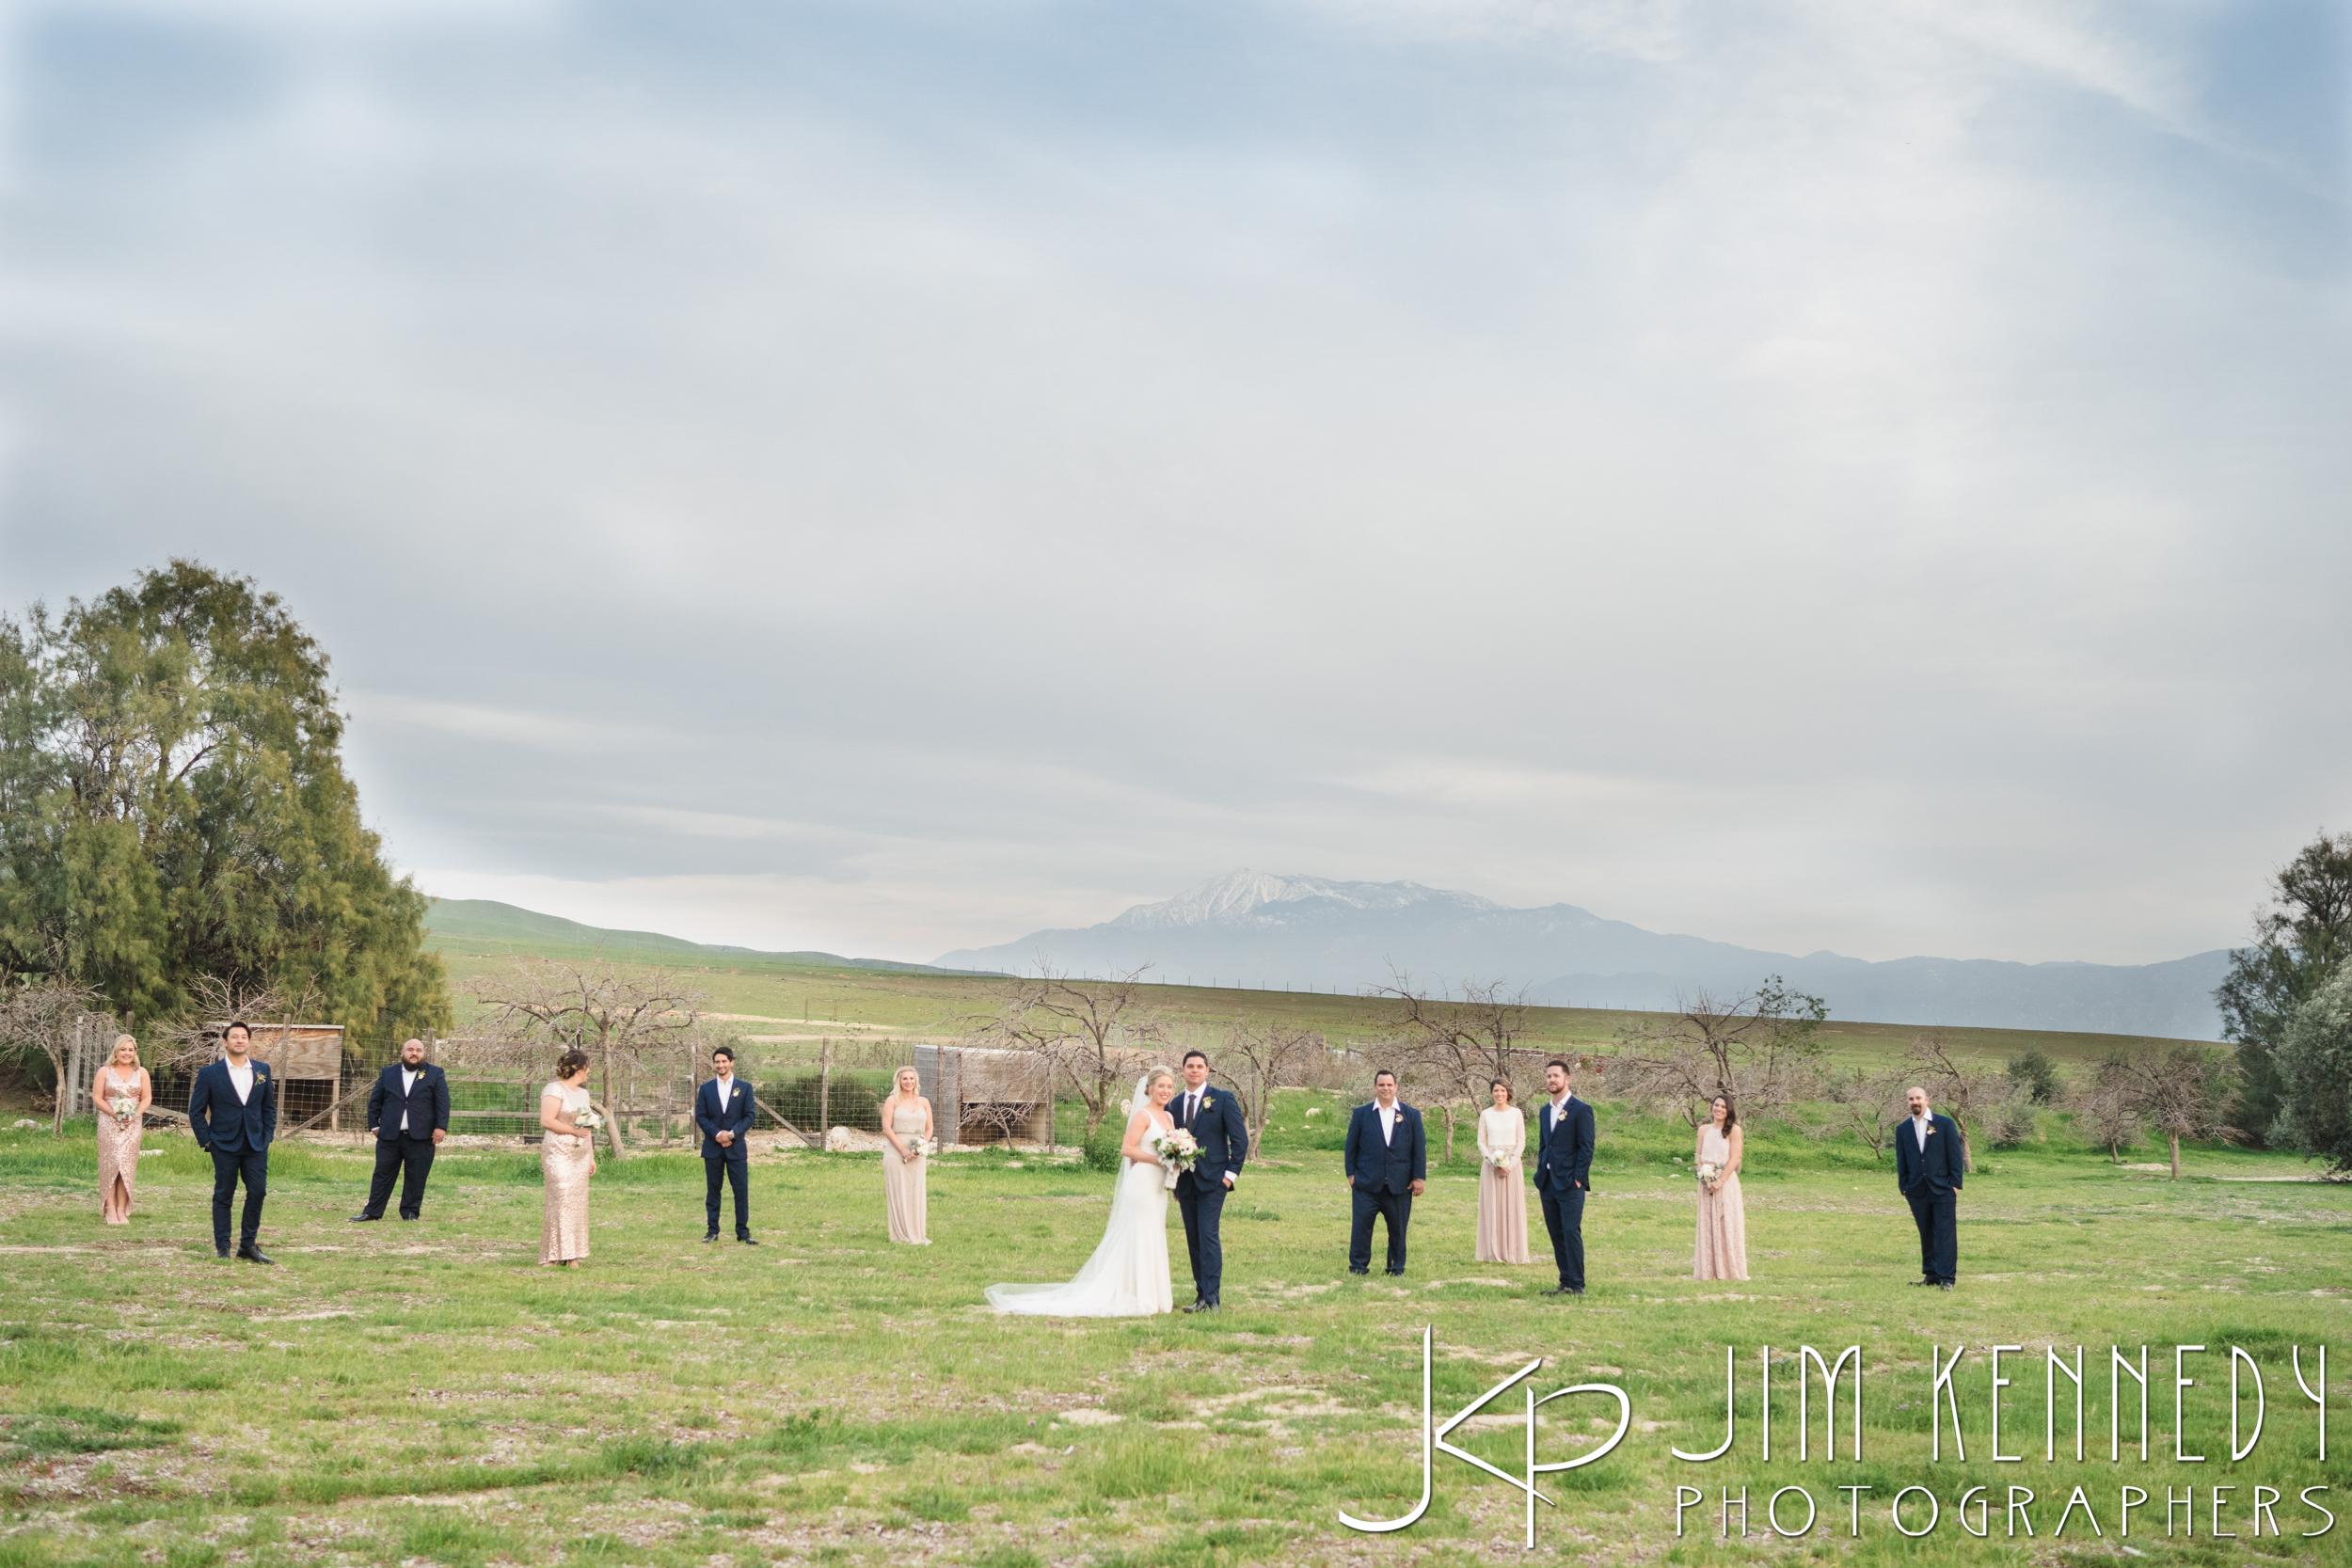 jim_kennedy_photographers_highland_springs_wedding_caitlyn_0131.jpg